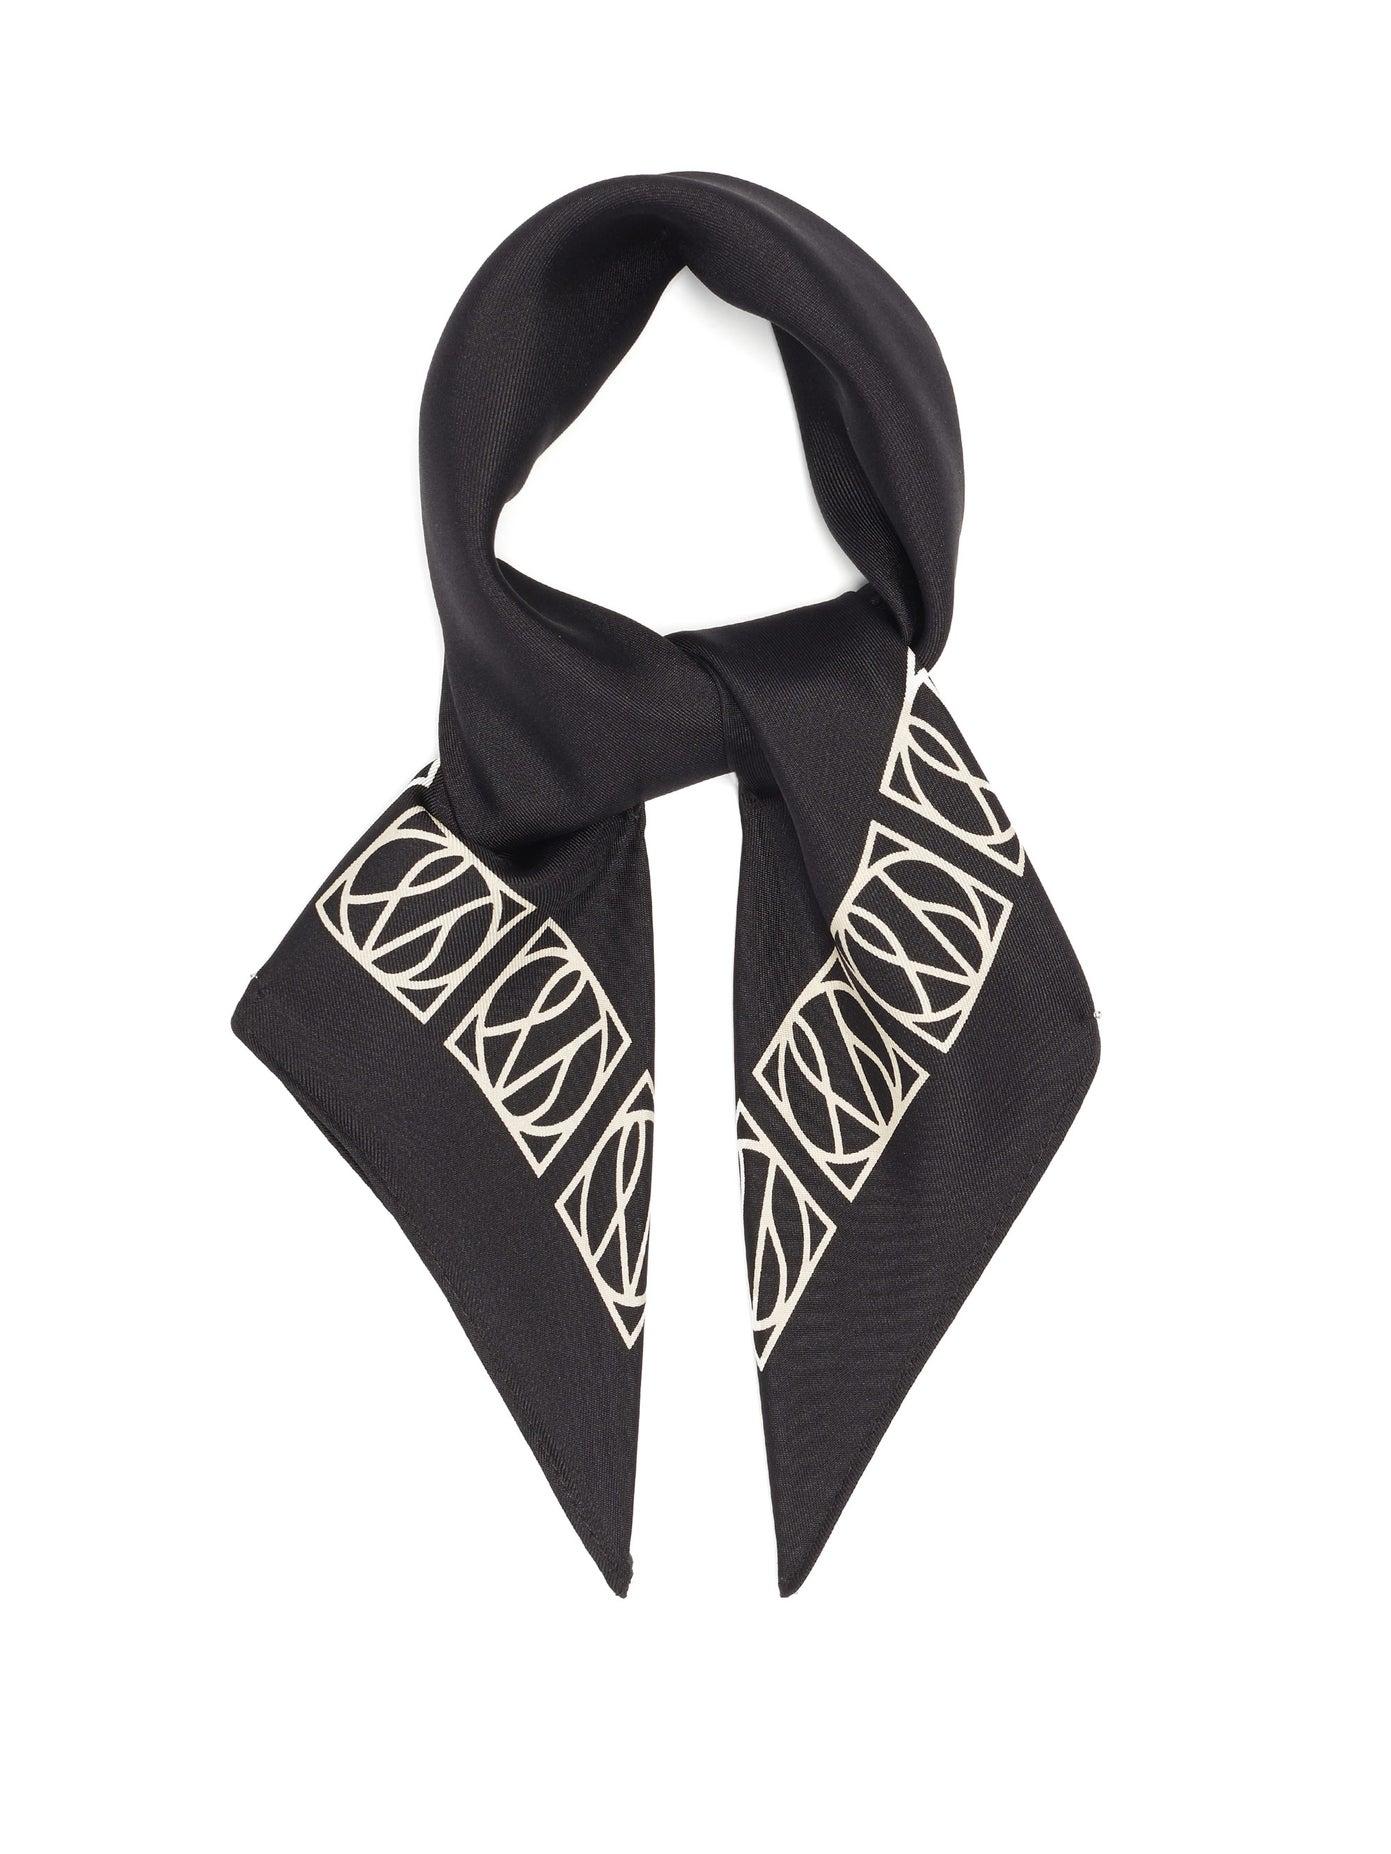 LeScarf, No. 20 monogram-print silk scarf, 138лв